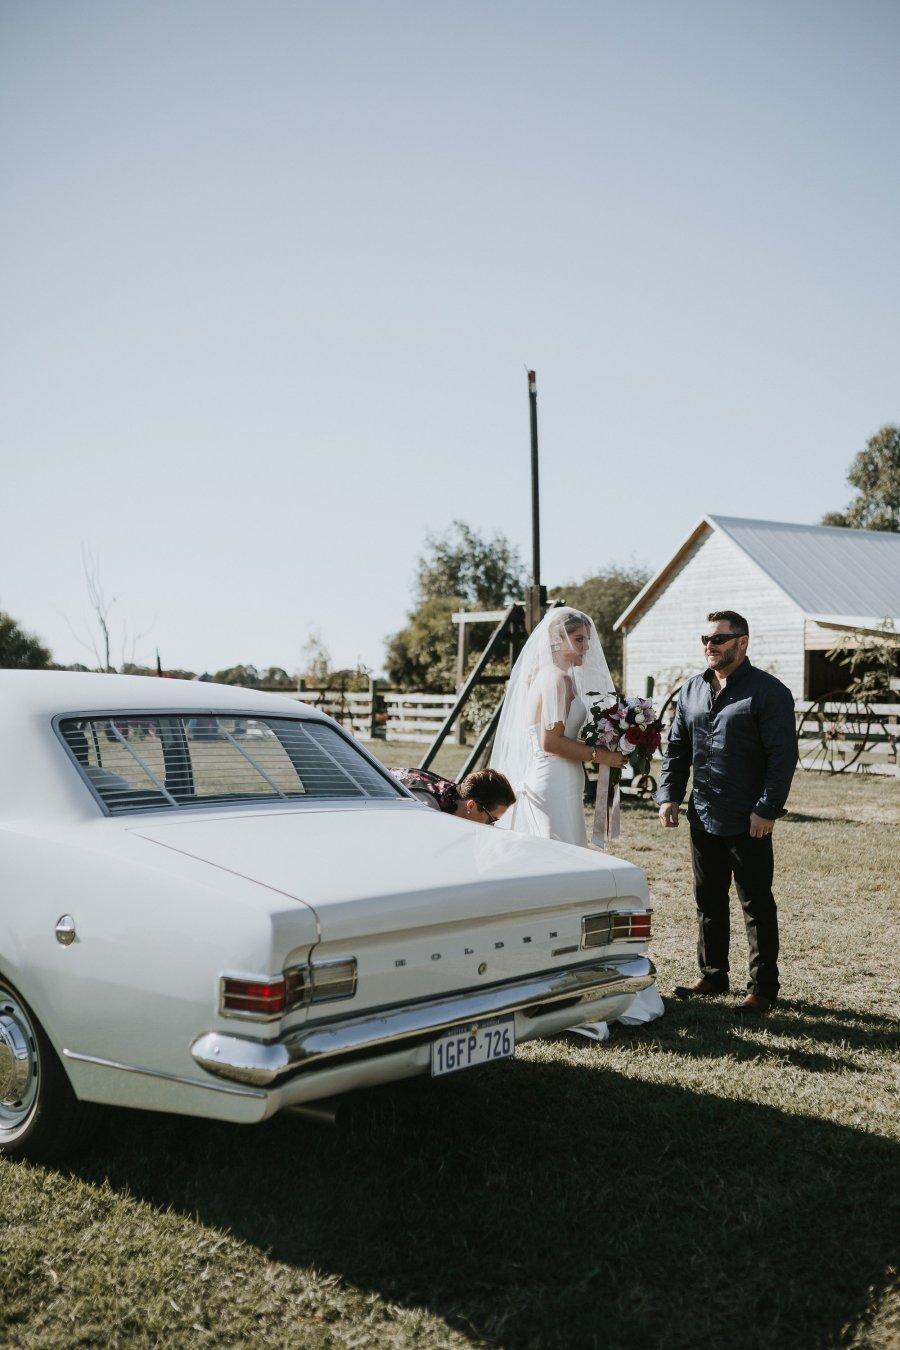 Perth Wedding Photographer | Ebony Blush Photography | Zoe Theiadore | K+T394